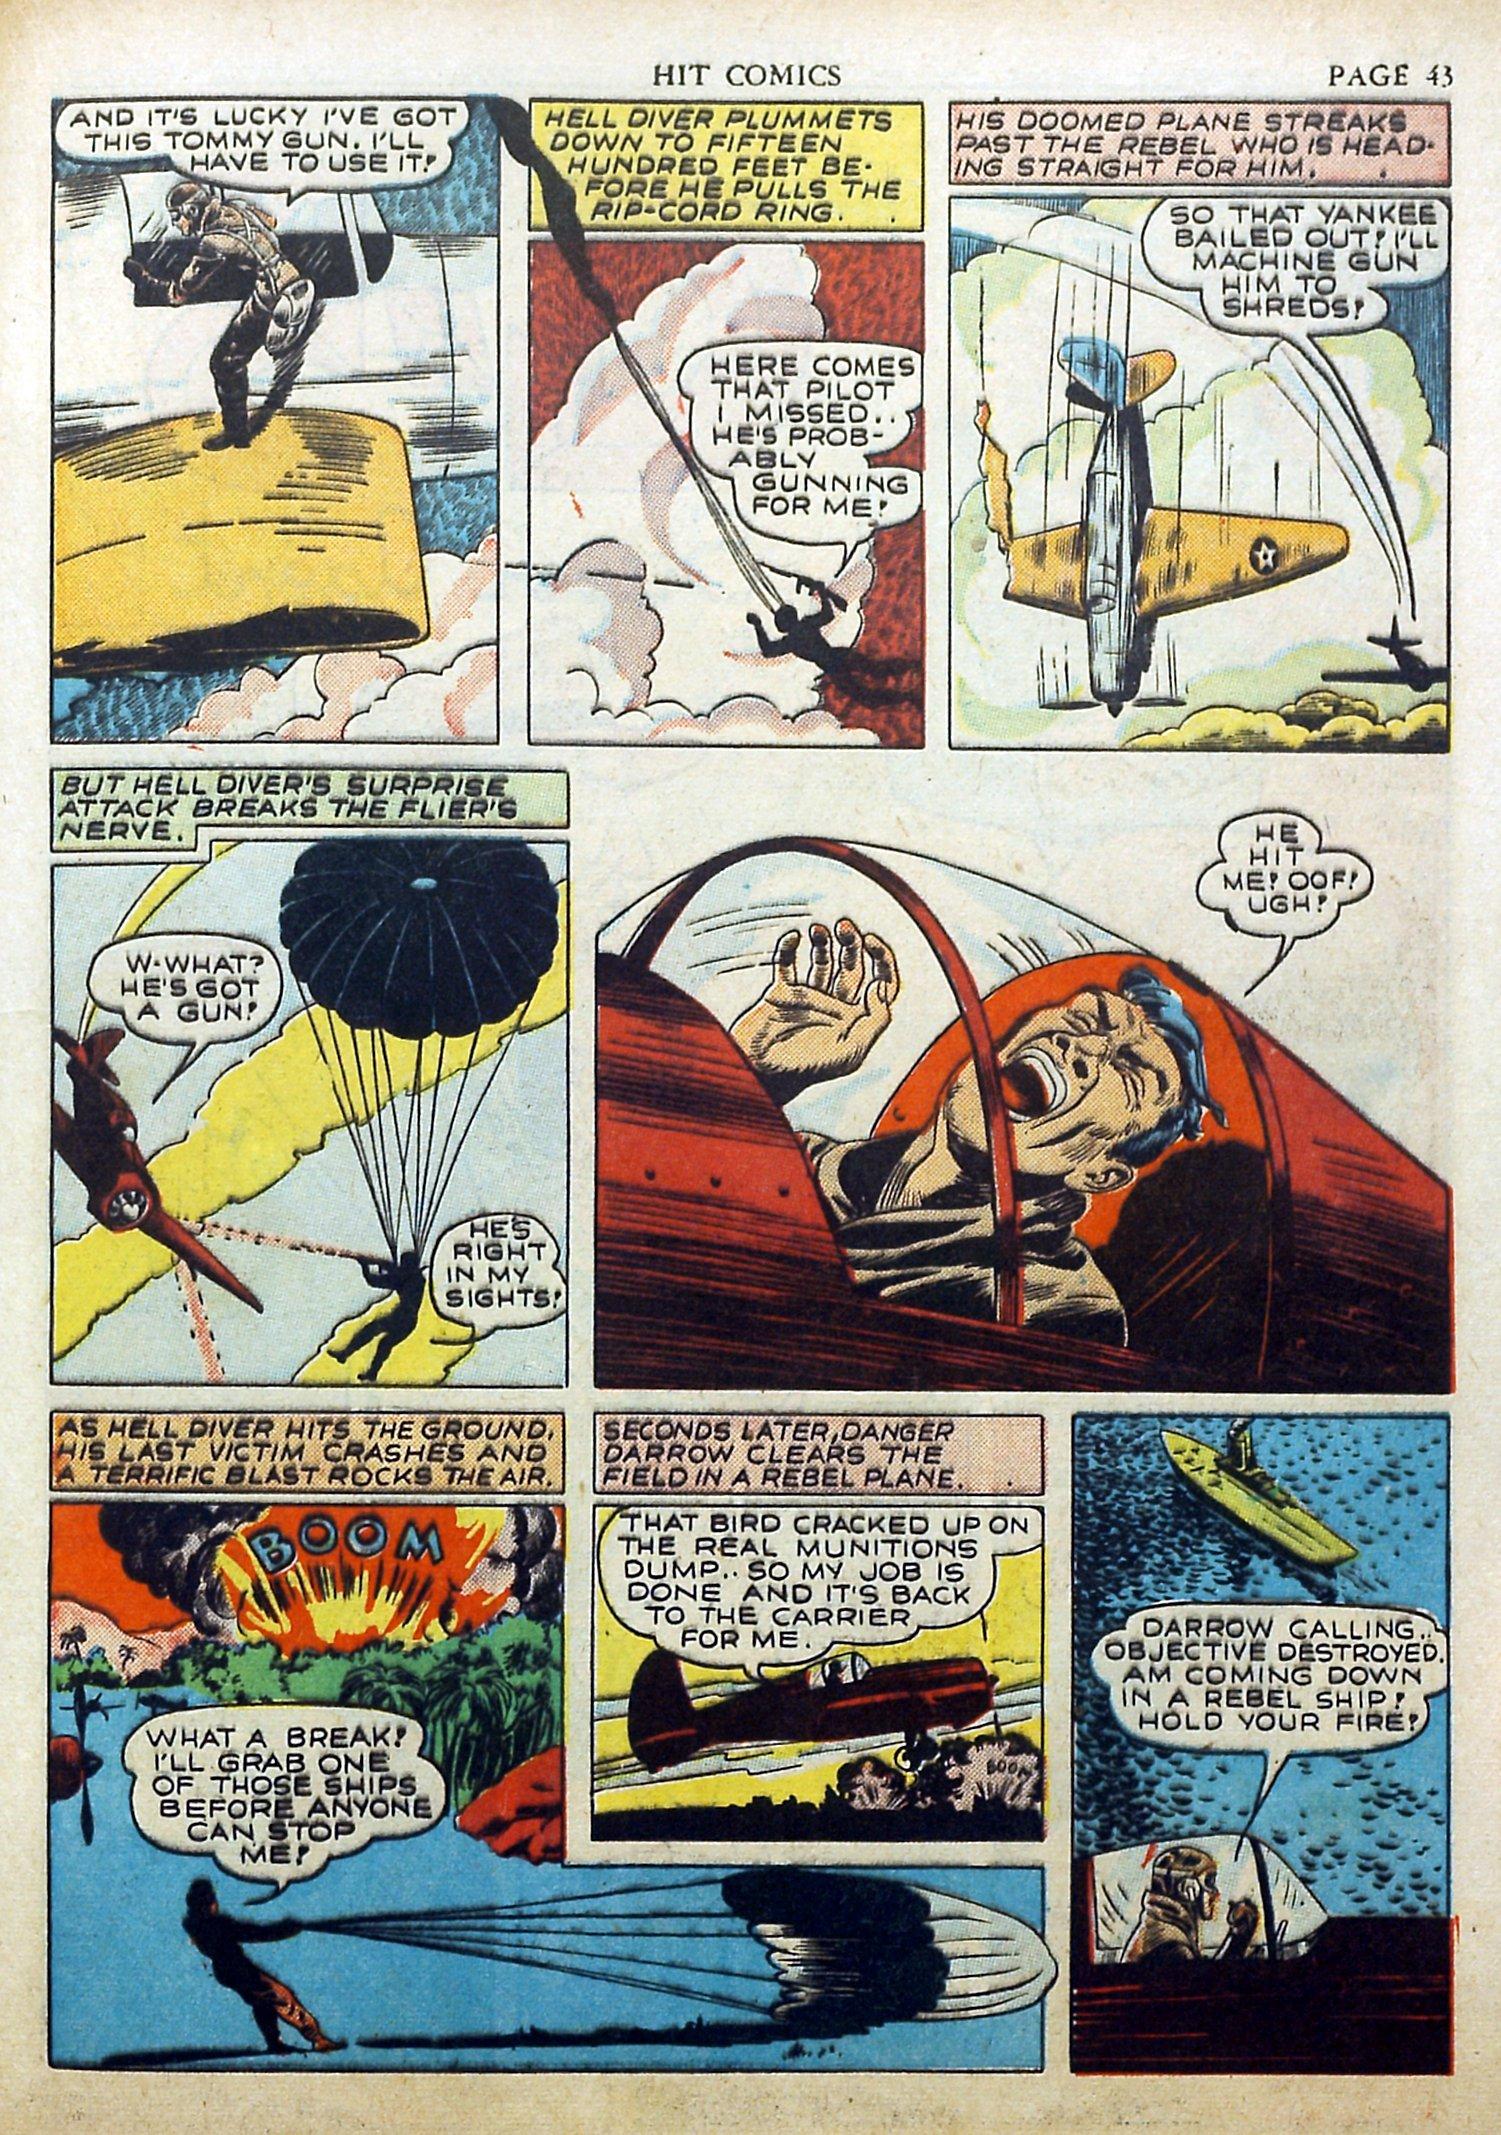 Read online Hit Comics comic -  Issue #17 - 45